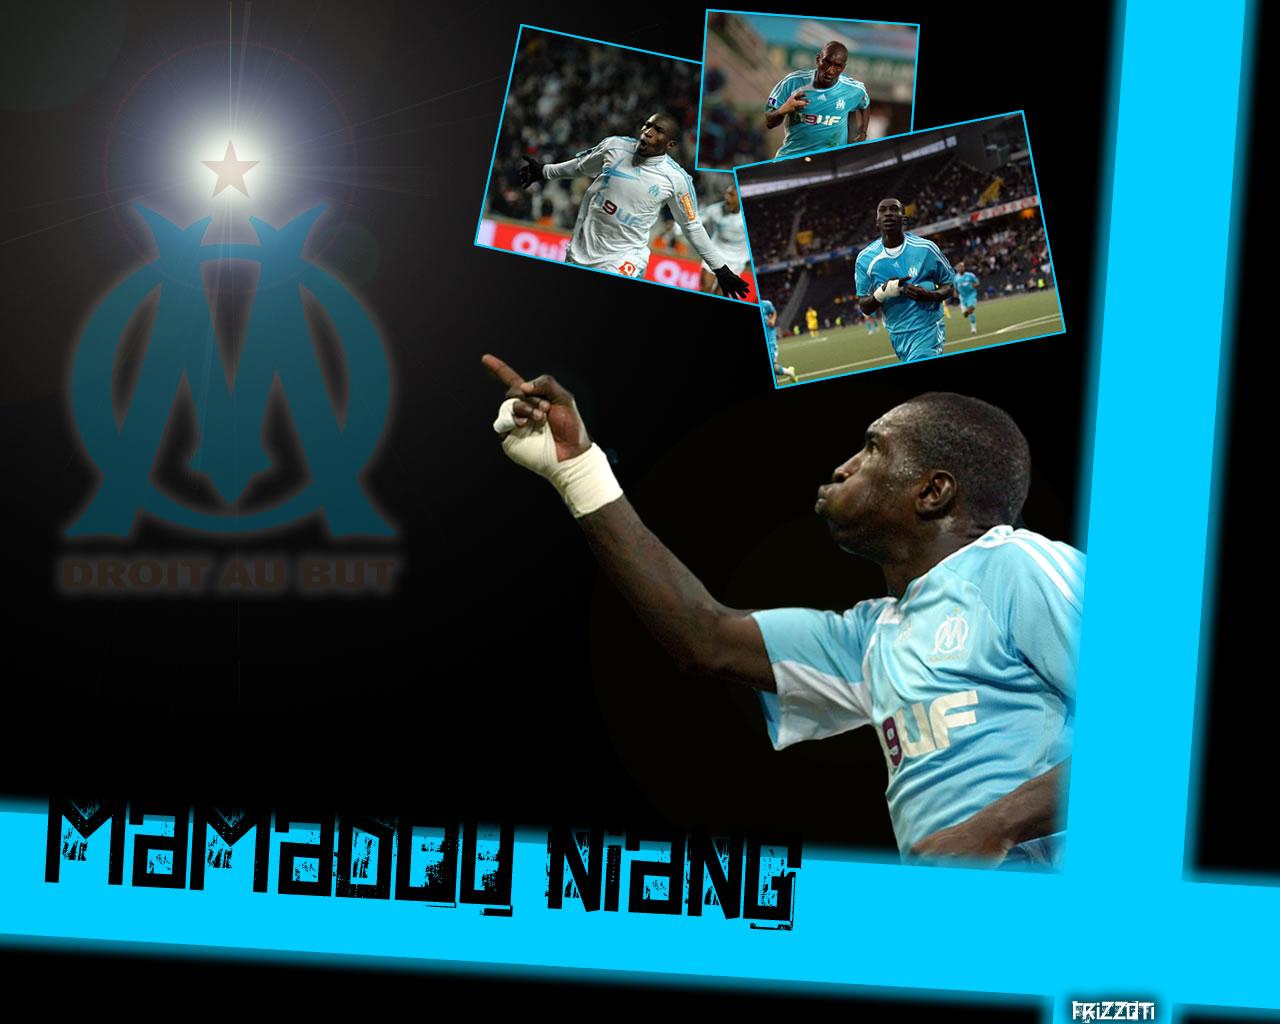 Fonds d'écran Sports - Loisirs OM Mamadou Niang - Olympique de Marseille (OM)